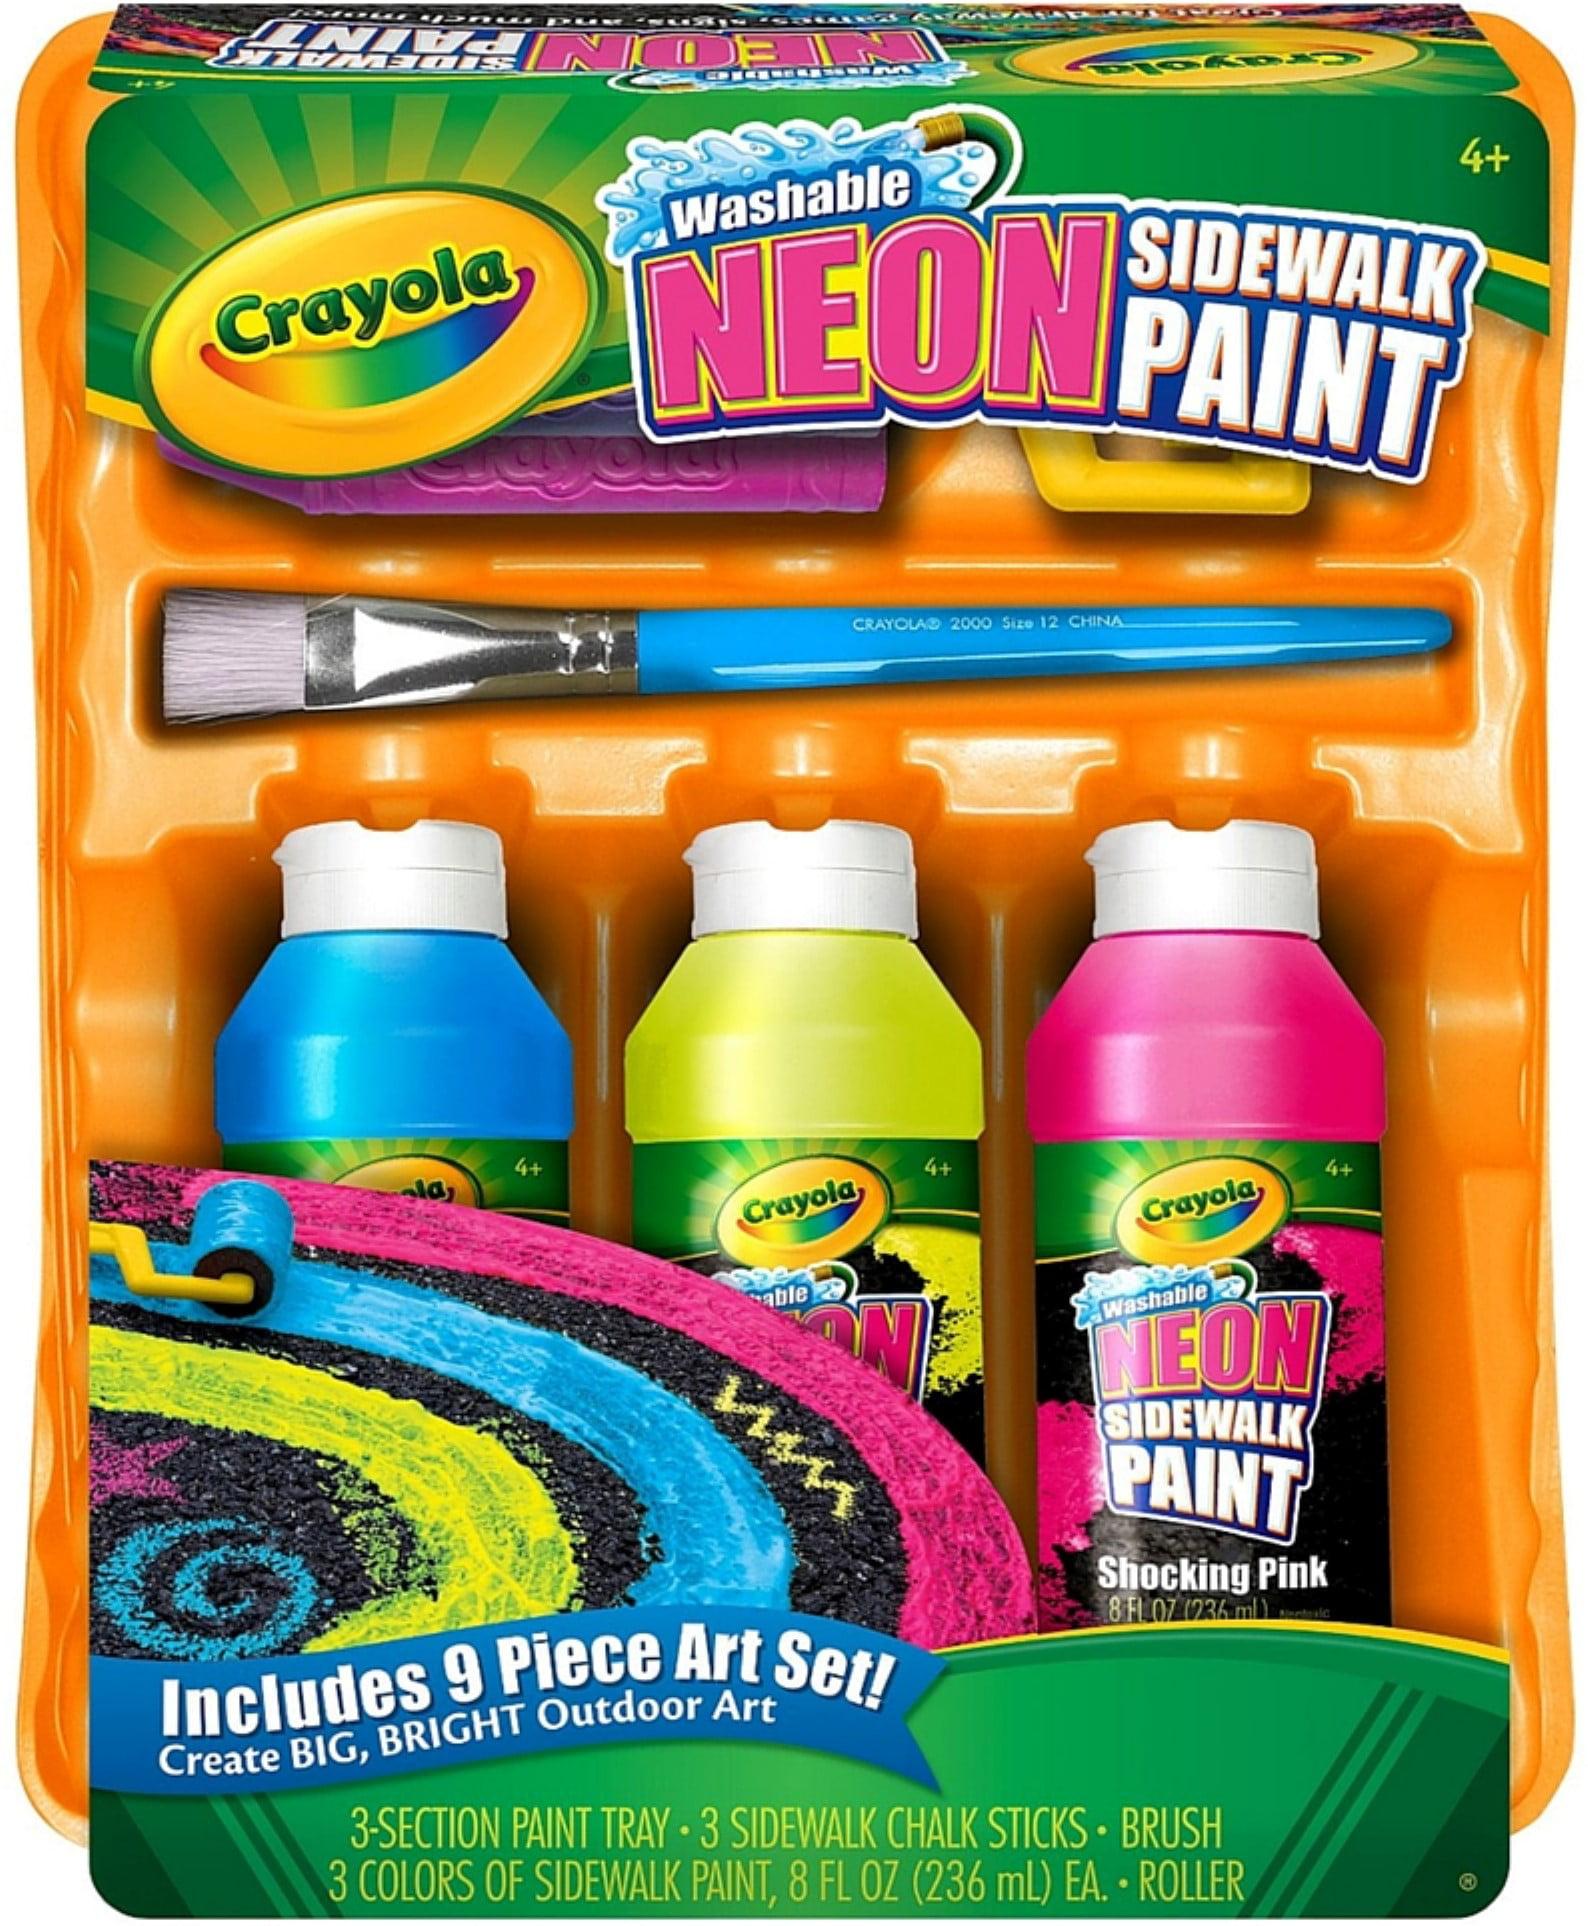 Crayola Neon Sidewalk Paint Tray Set by Crayola Markers